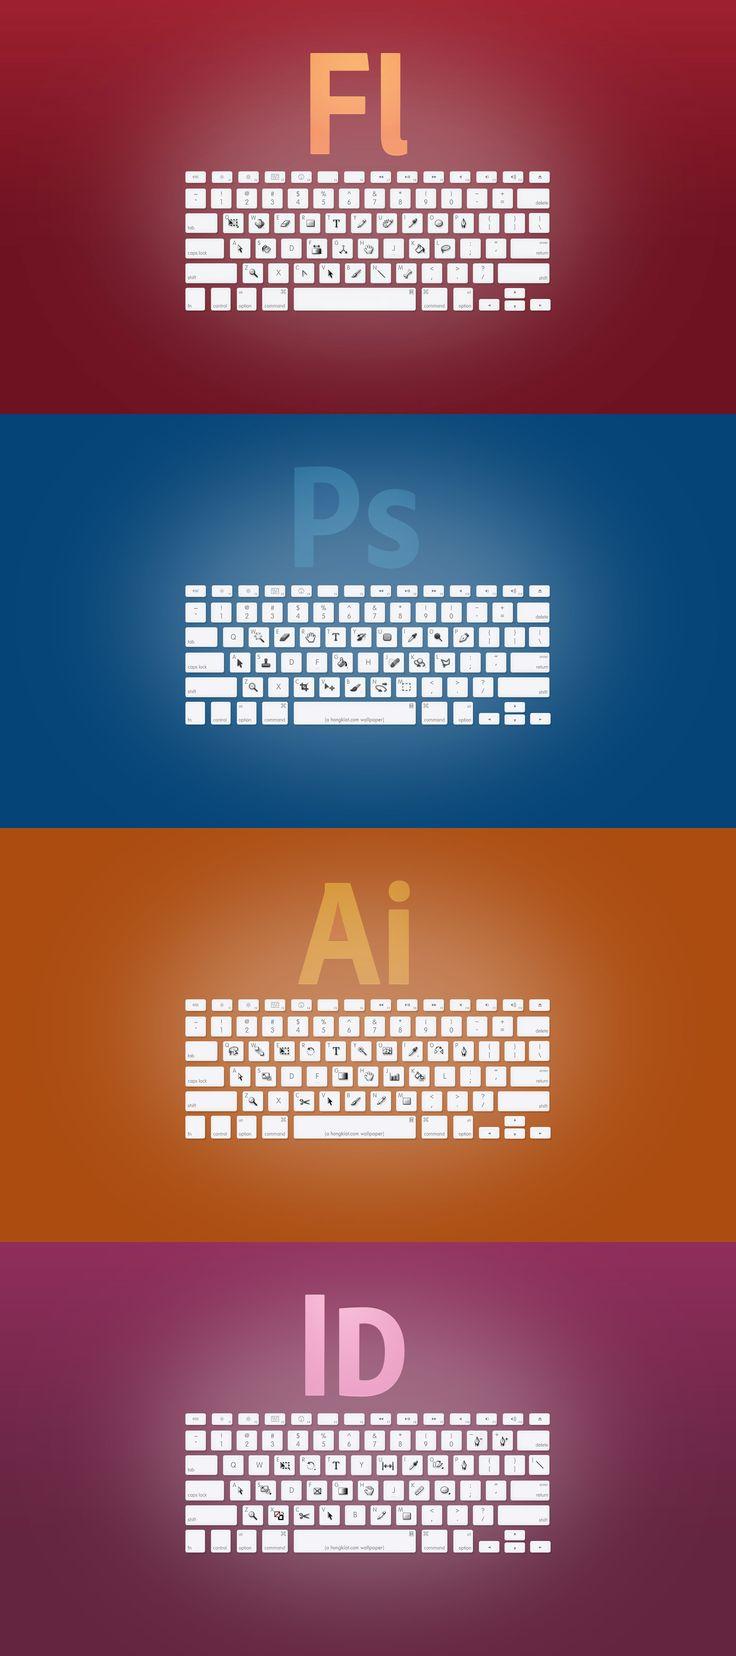 Adobe Keyboard Shortcuts Guide